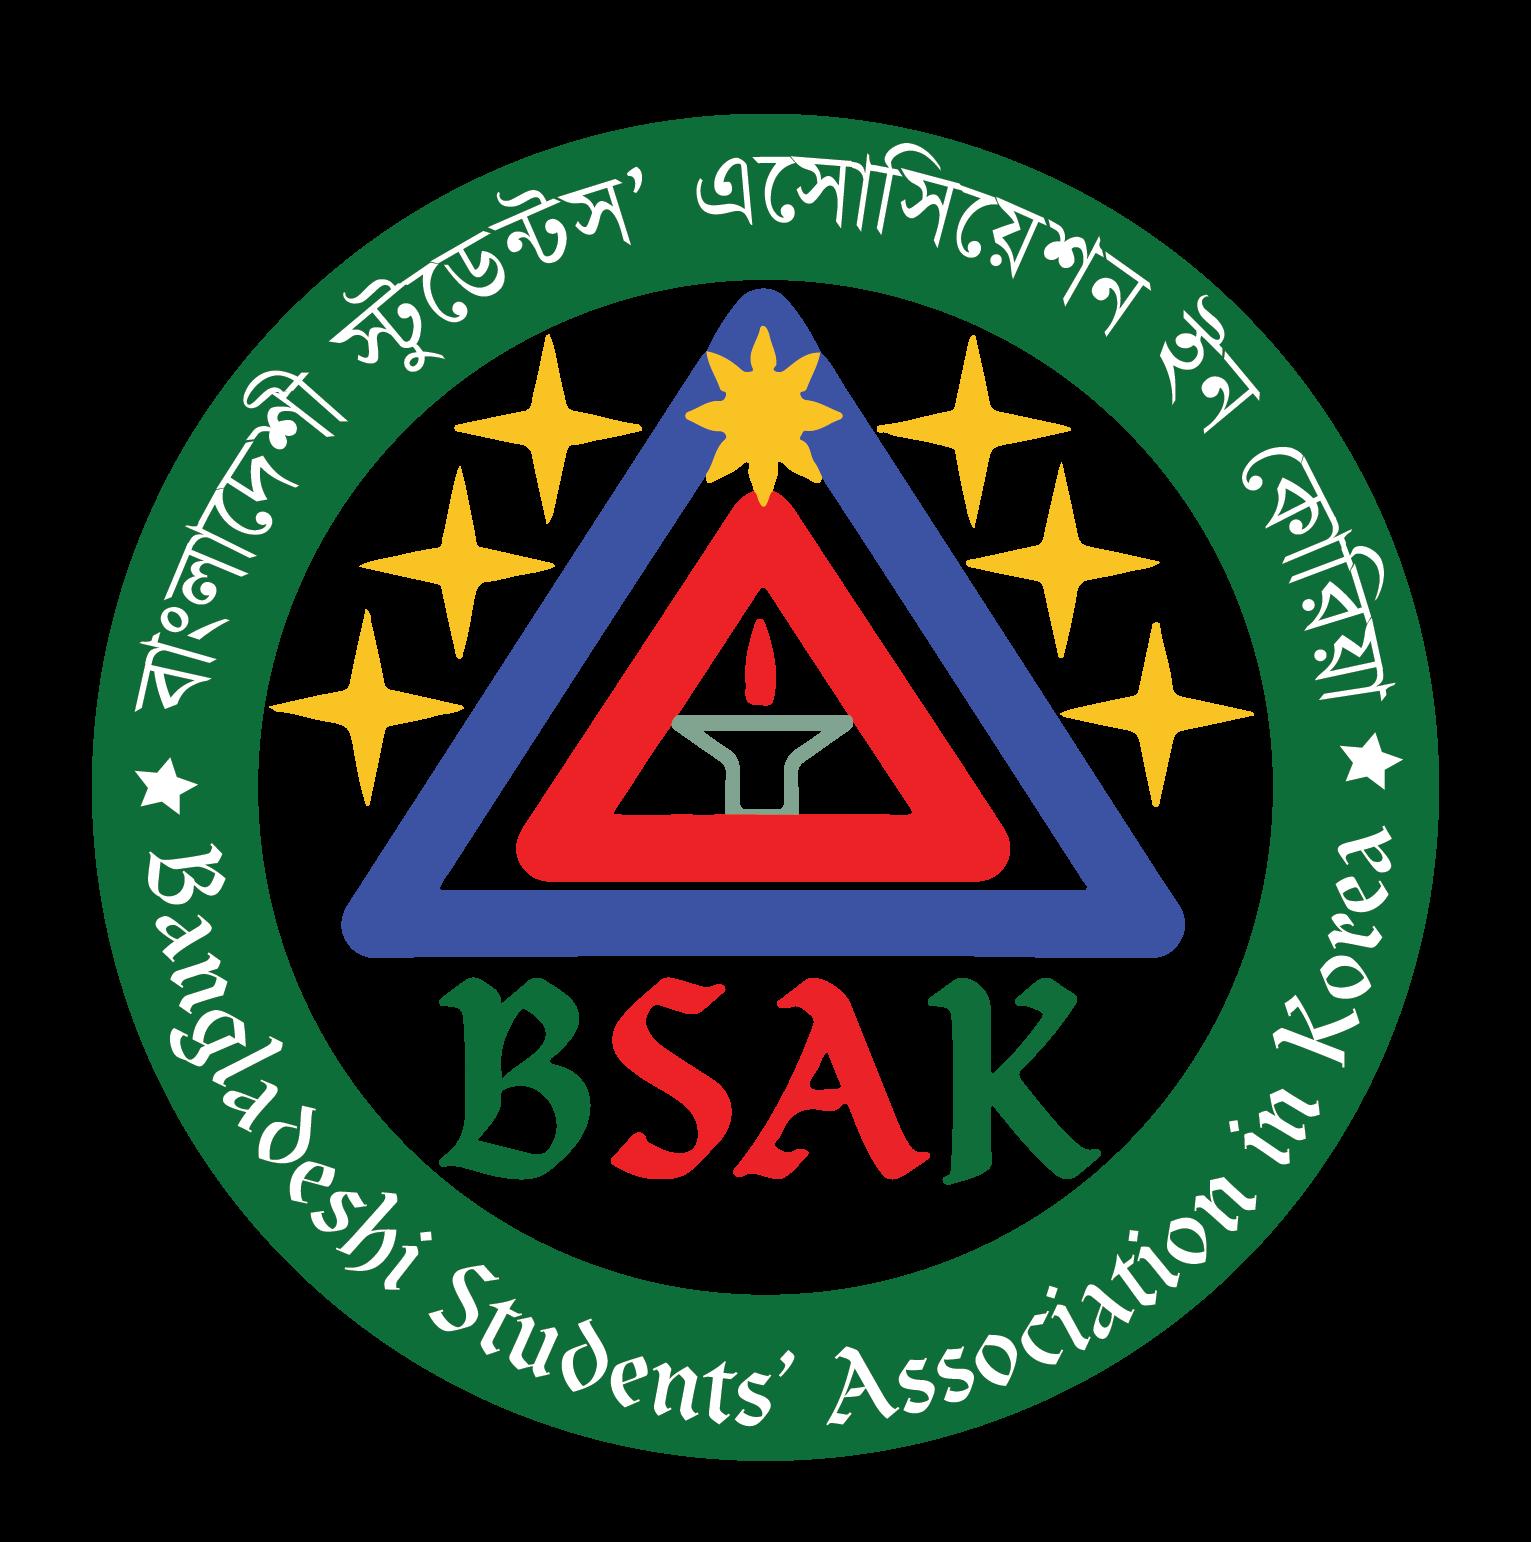 bsak.org